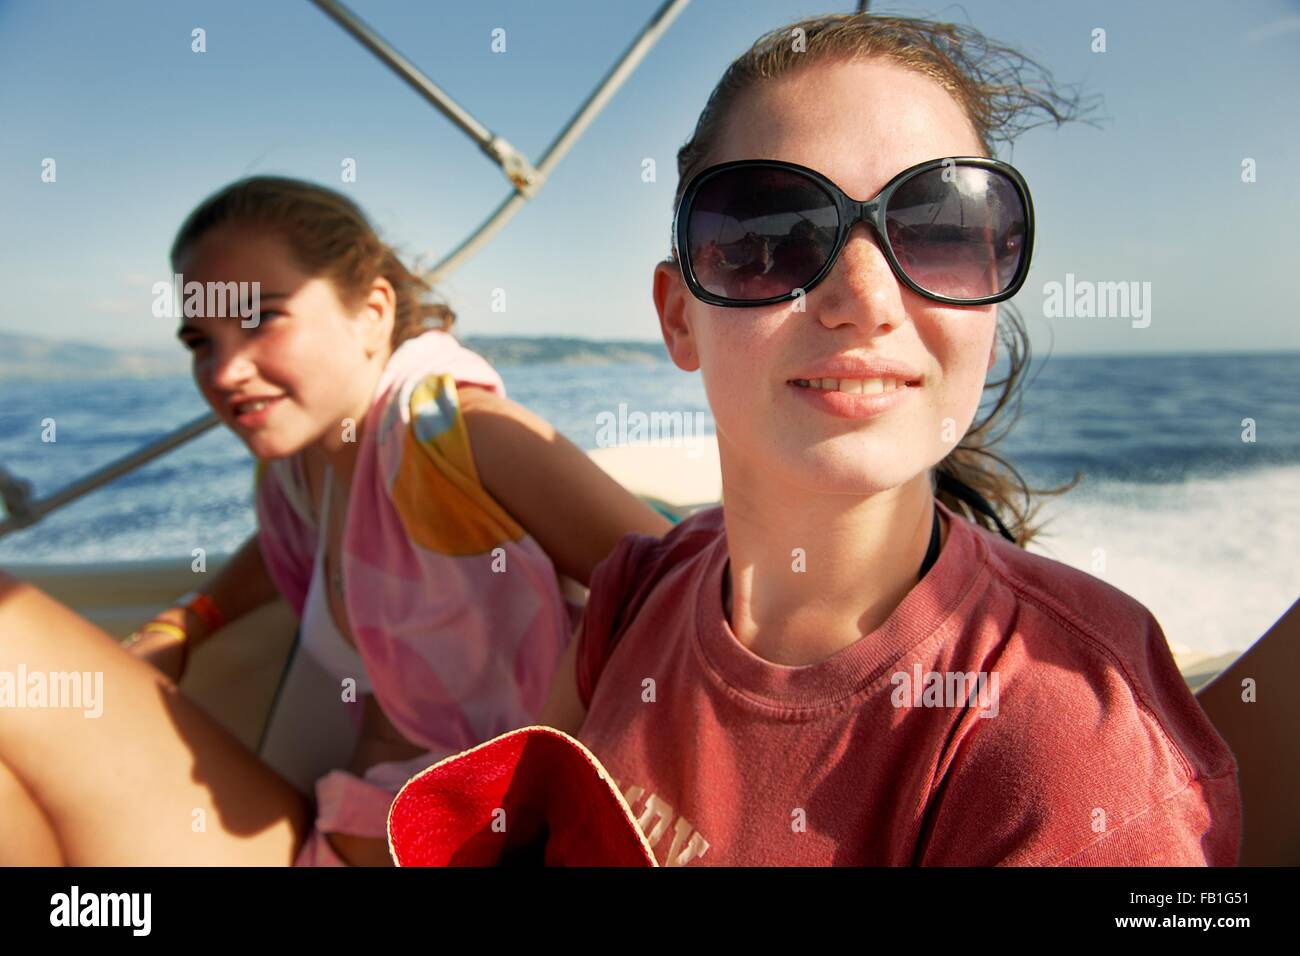 Imágenes Stockamp; Fotos On Girls Bikini De Boat PXZiwkuTO